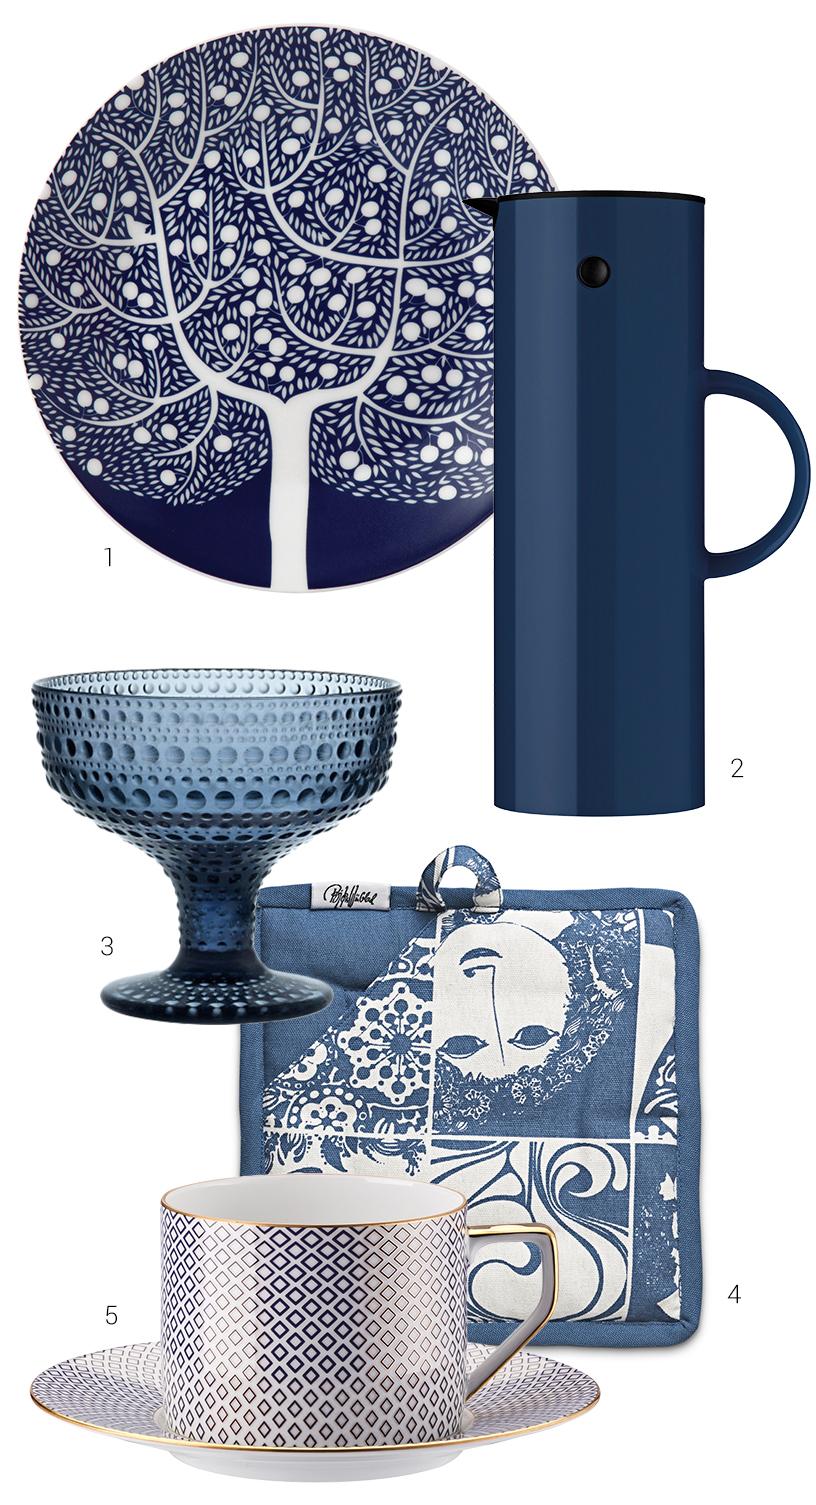 Royaldoulton-Stelton-Iittala-Rosendahl-Rosenthal-Blau-Ambiente-Farbe-02